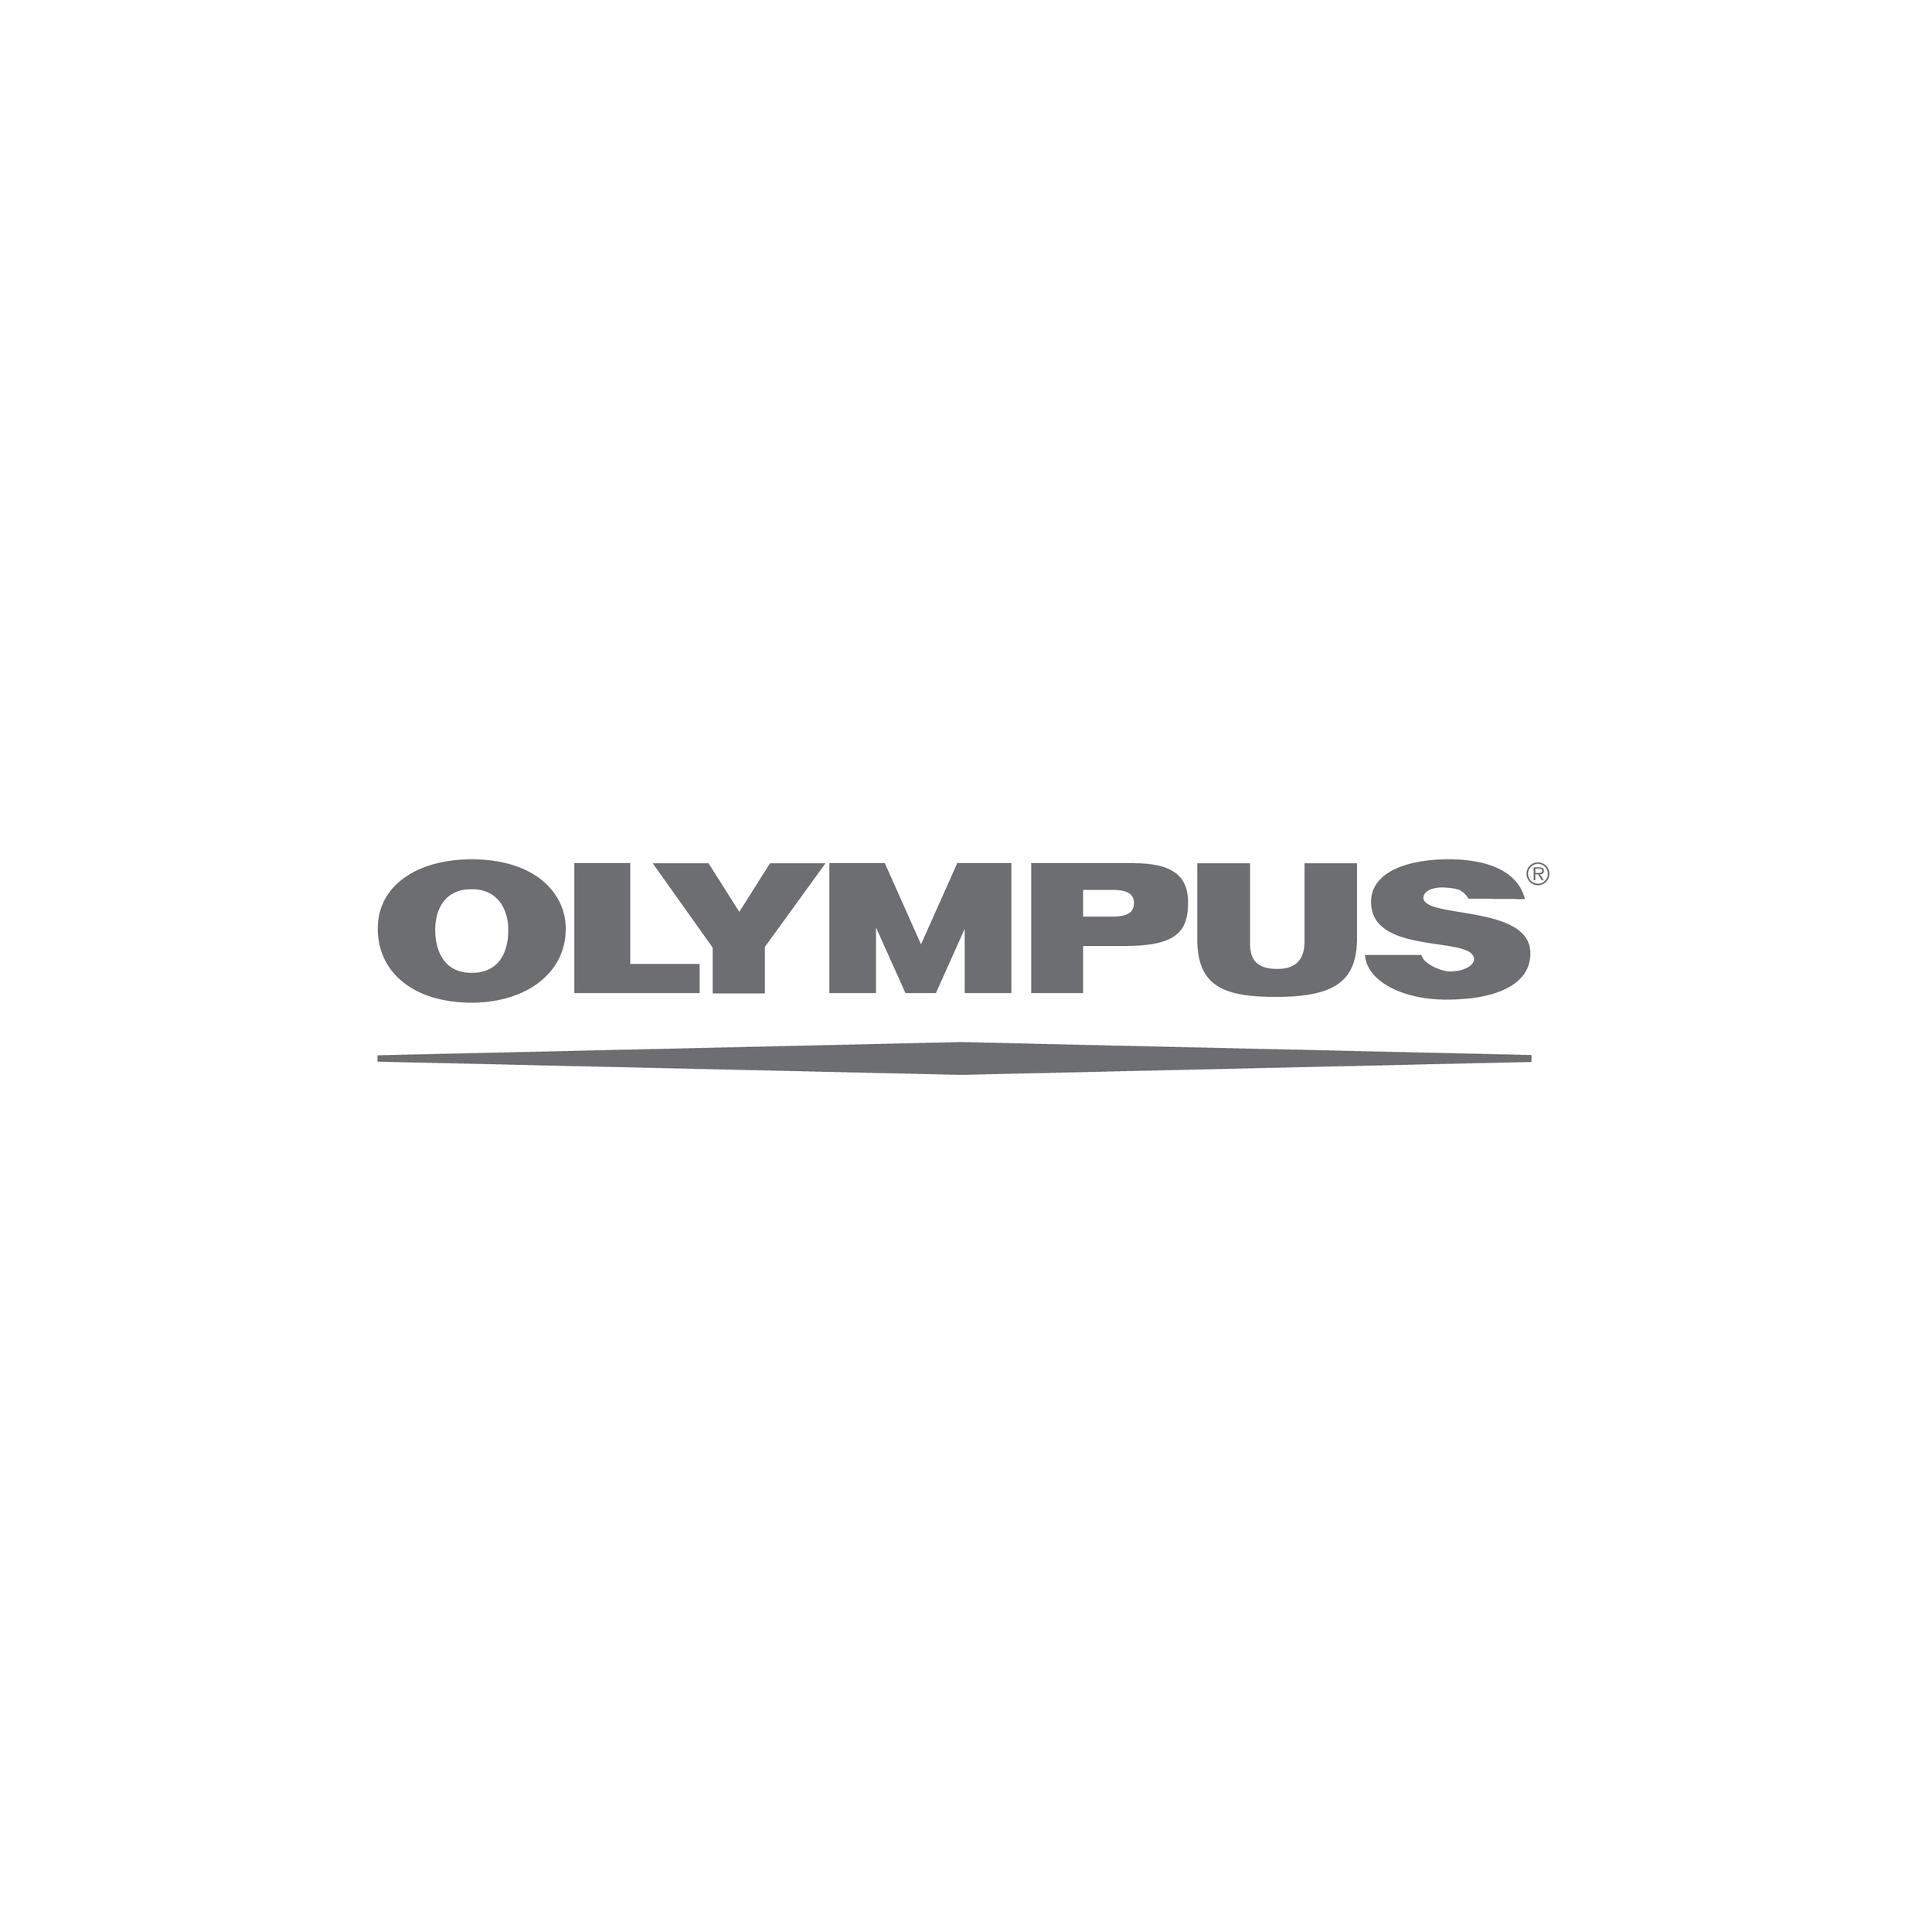 Logo-22-Olympus.jpg